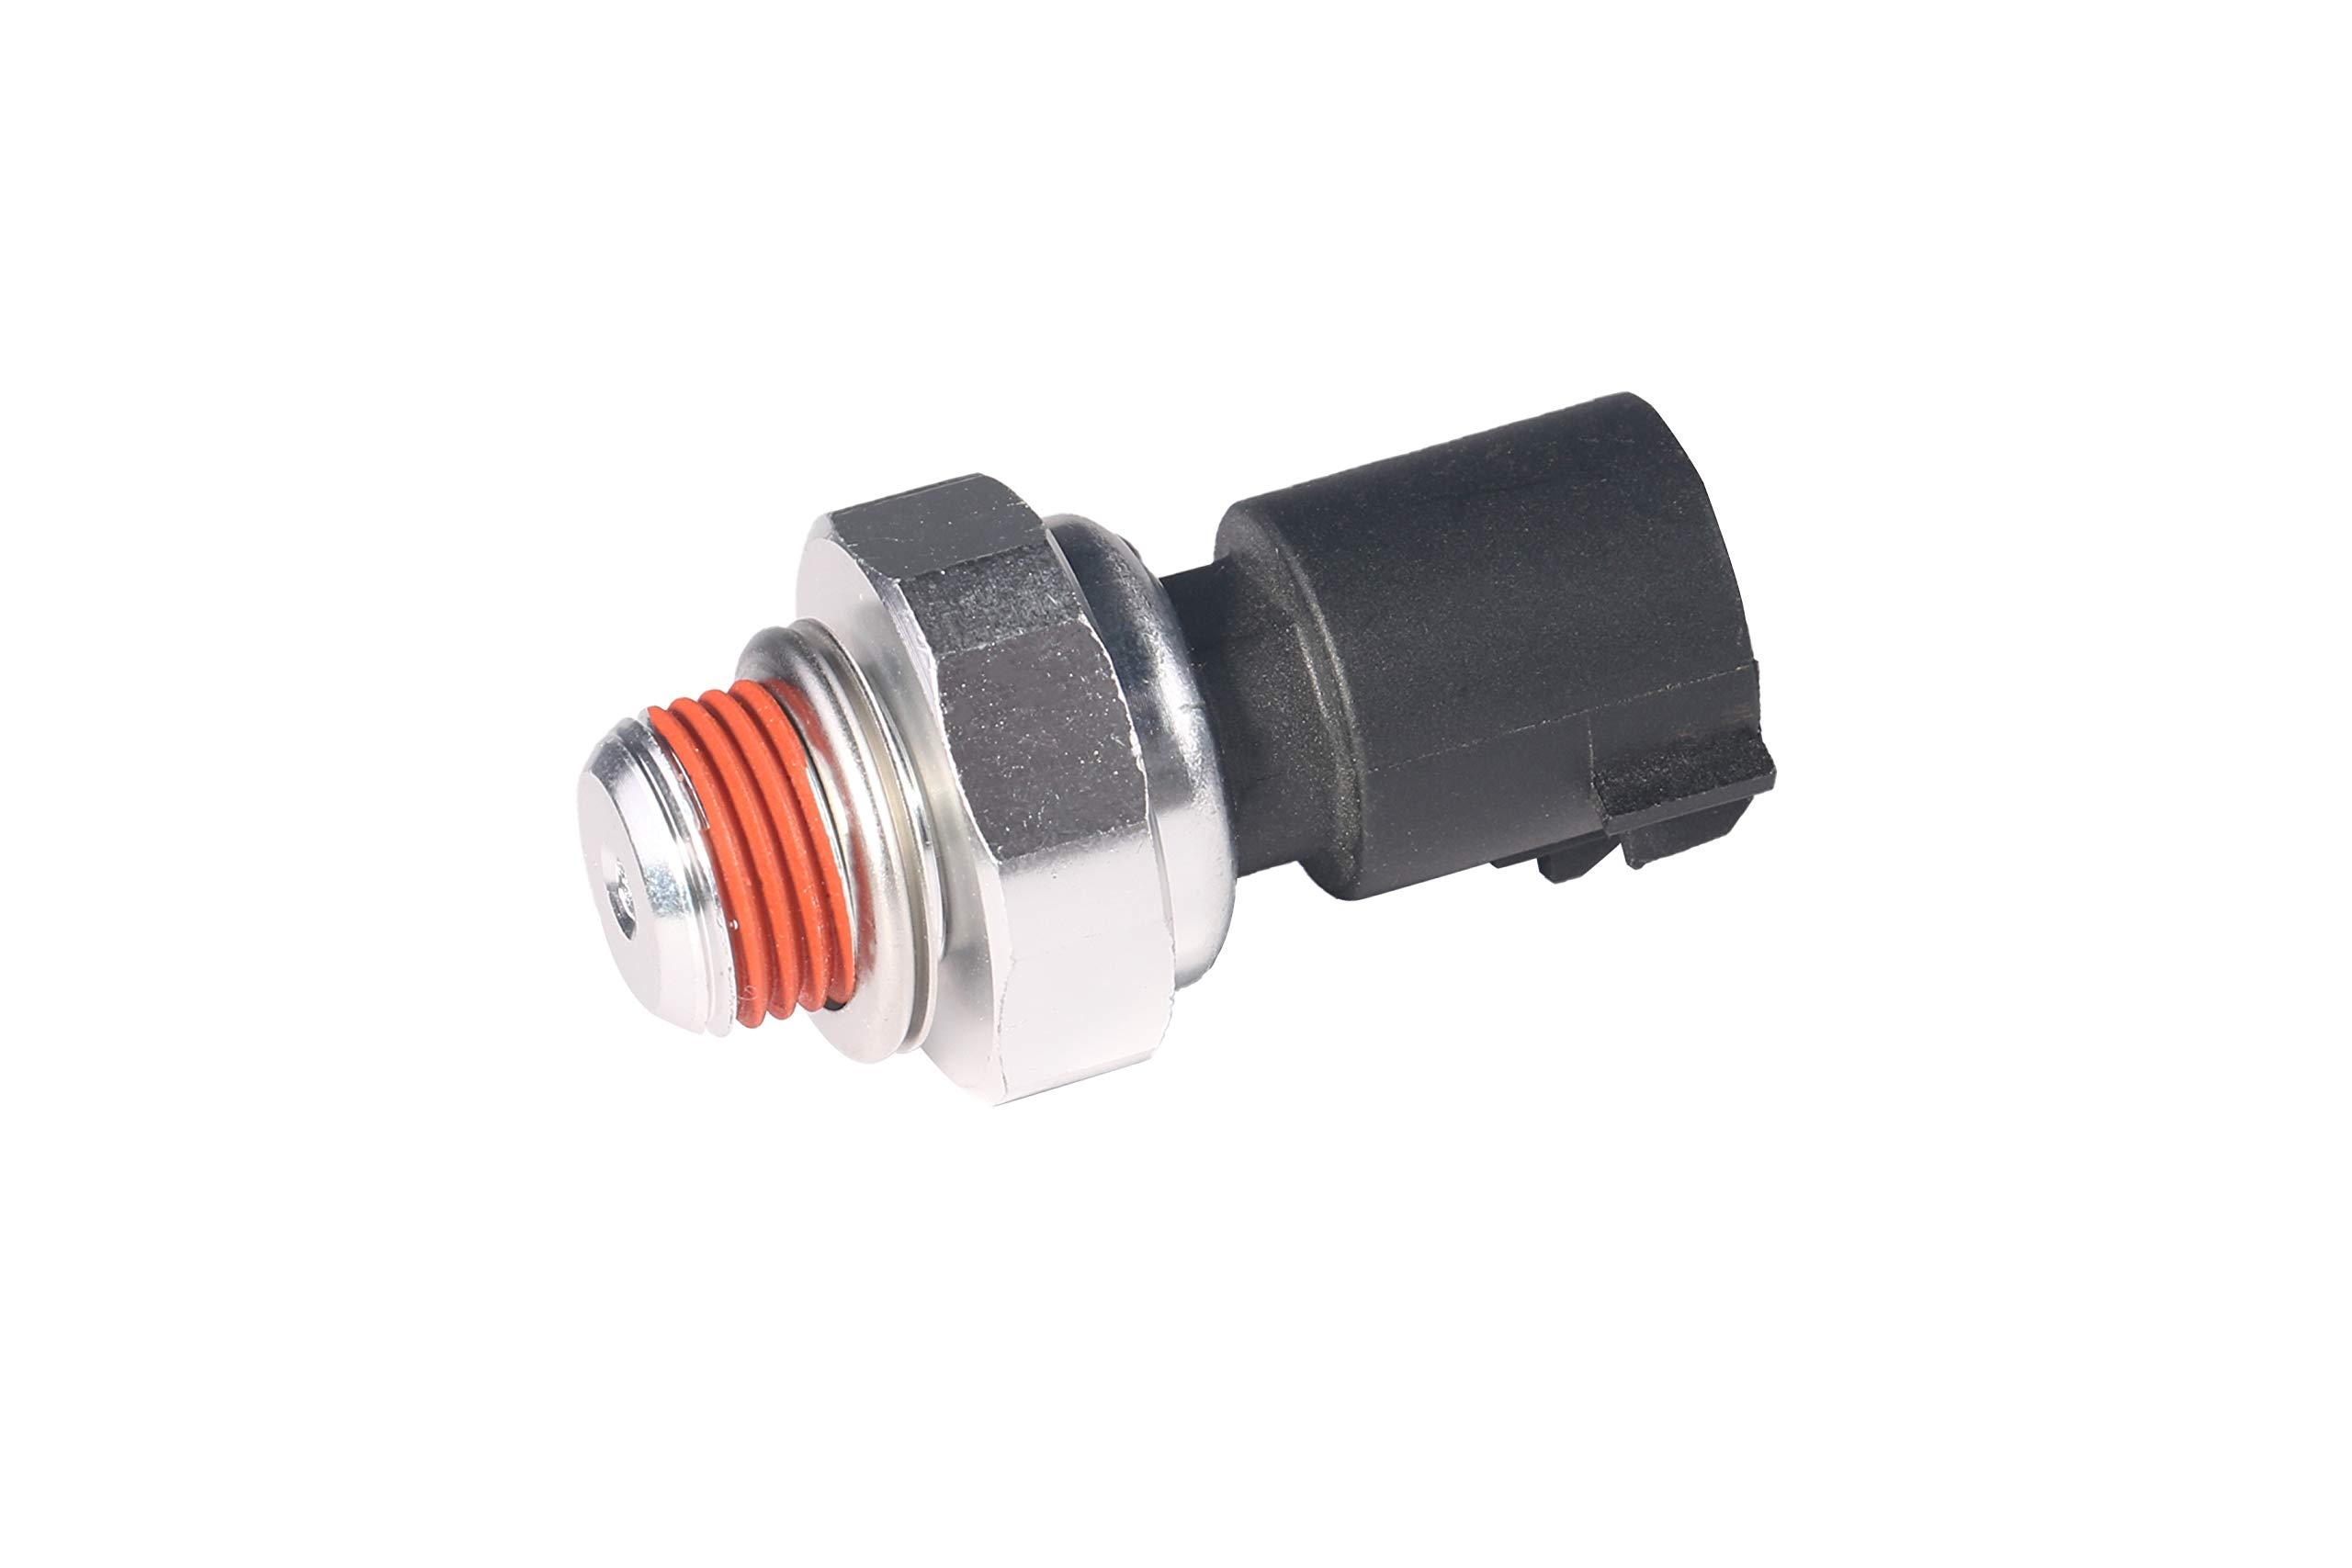 Engine Oil Pressure Sensor - Replaces 12673134, 12585328, 926-041 - Fits Chevy Silverado, Suburban 2500, Tahoe, Impala, Trailblazer, GMC Yukon, Sierra 1500, Savana and more - Oil Pressure Sending Unit by AA Ignition